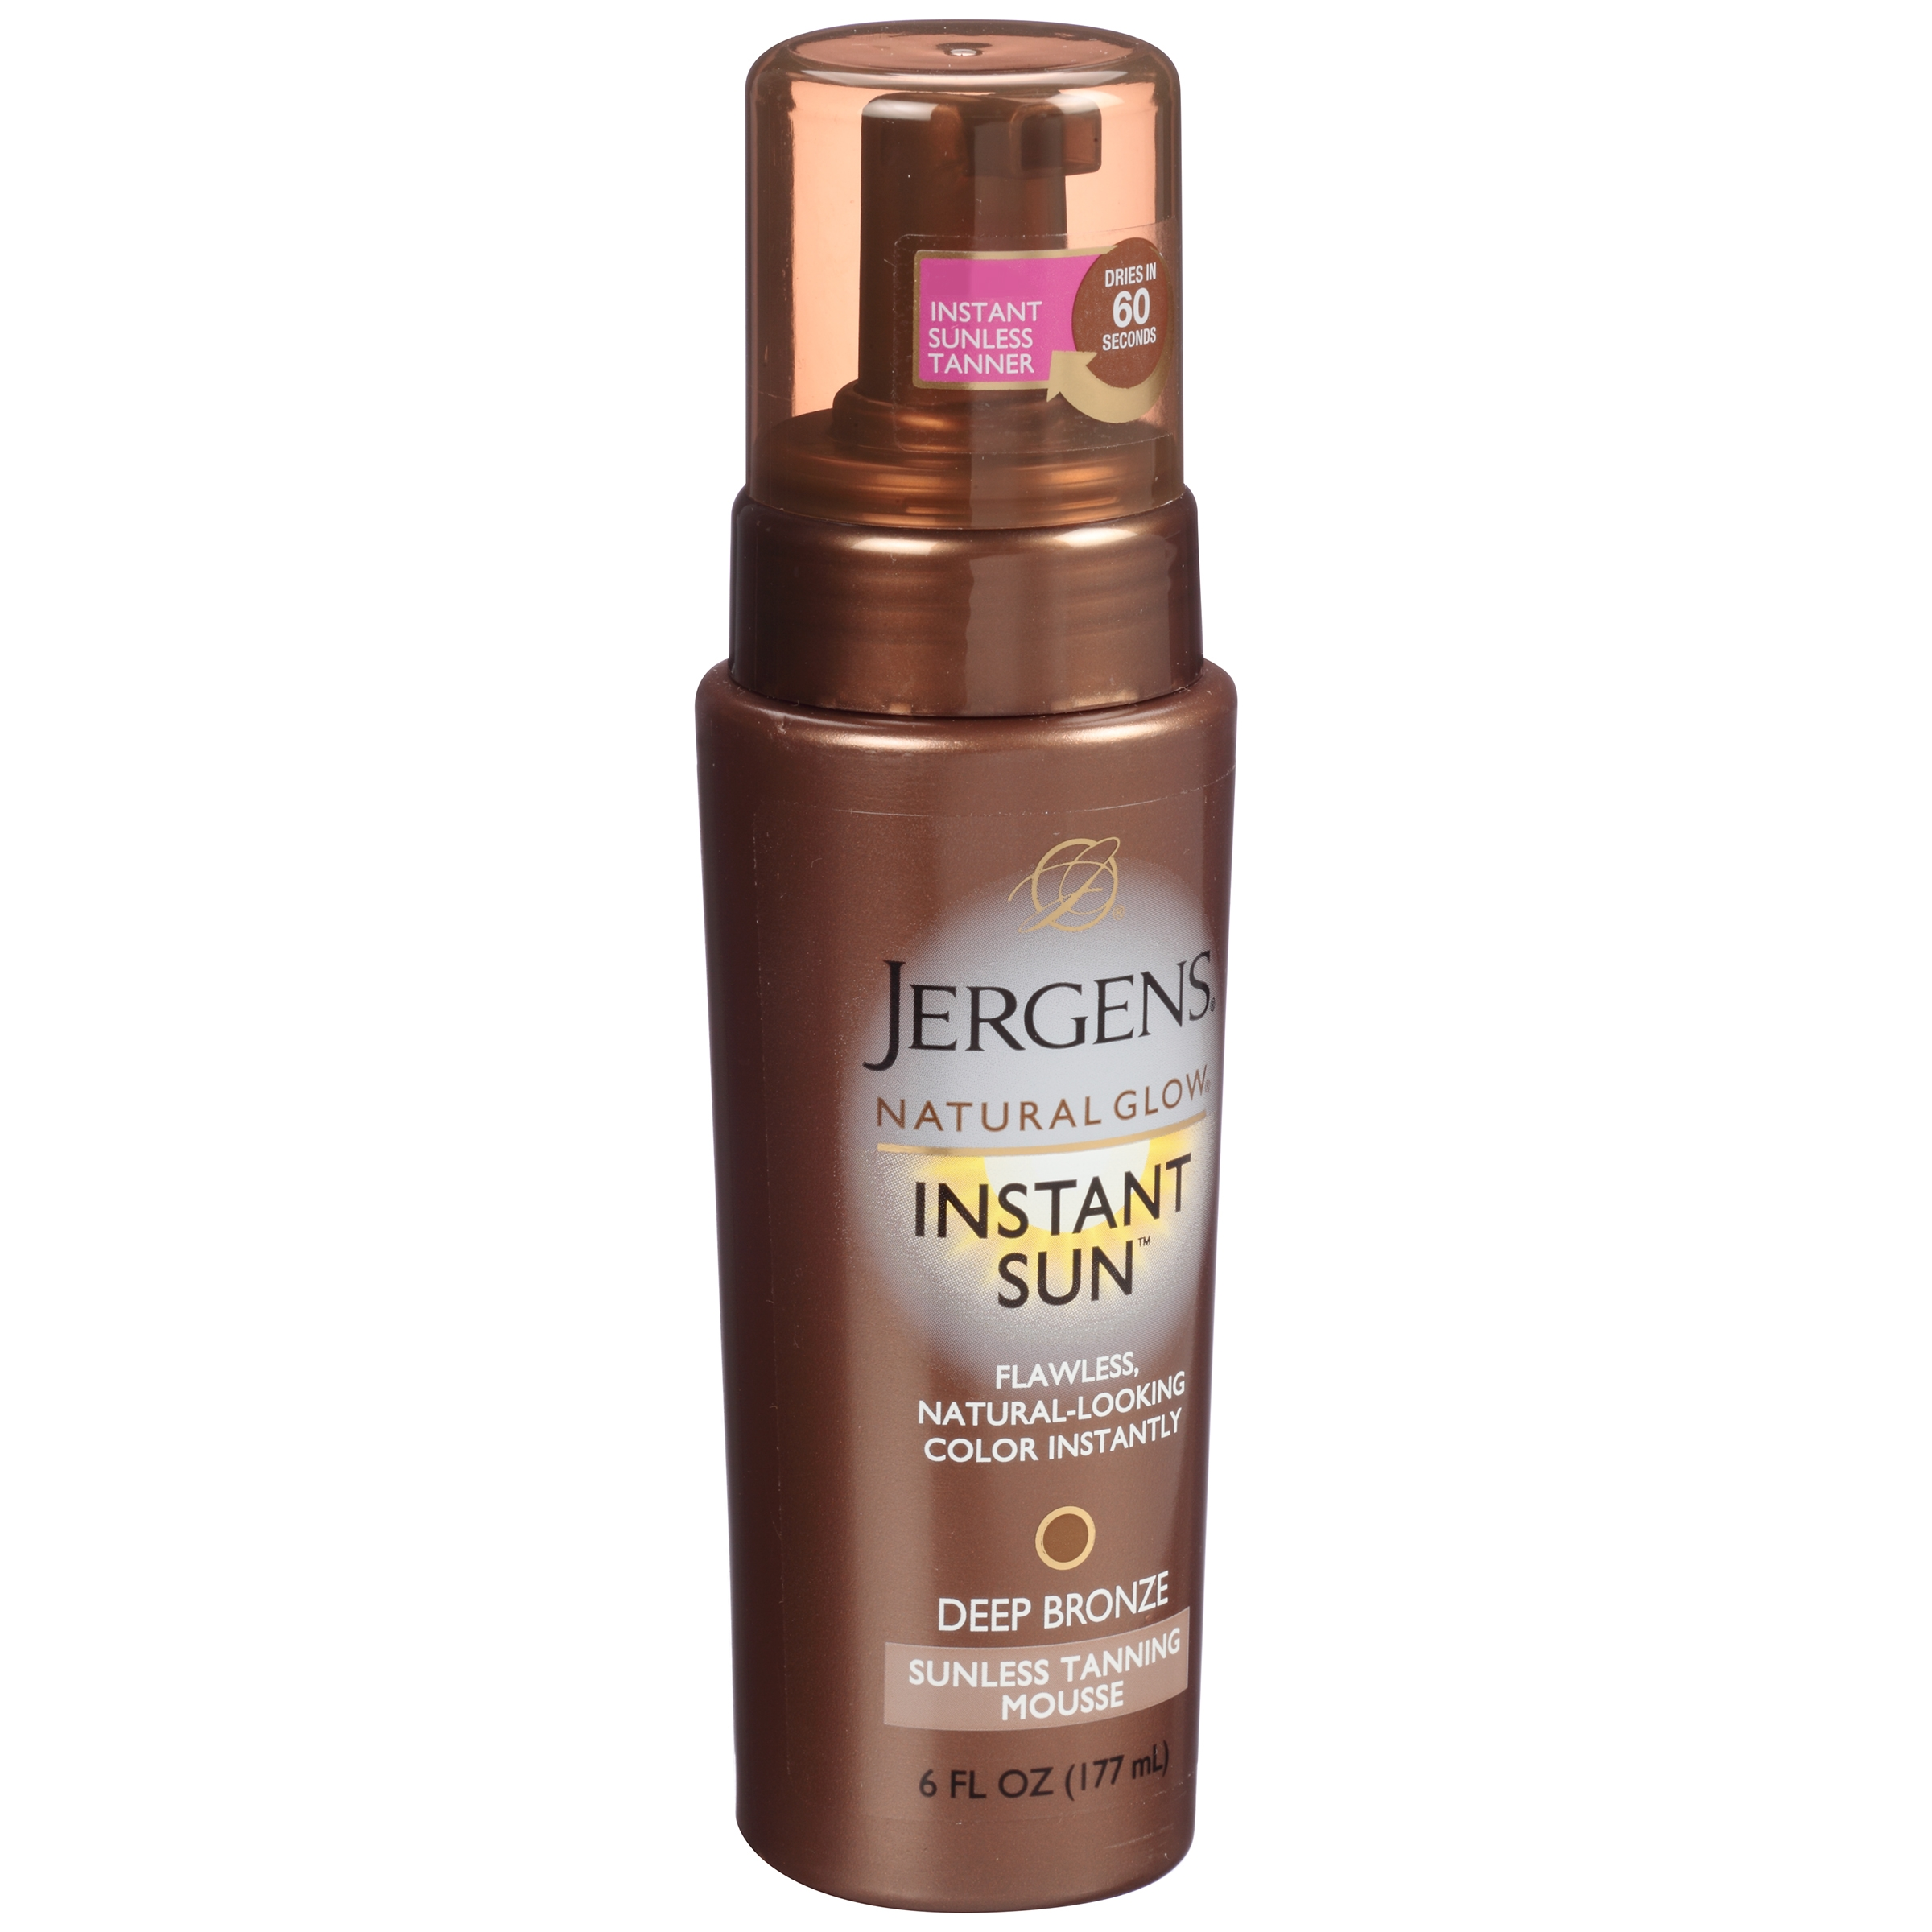 Jergens Natural Glow Instant Sun Deep Bronze Sunless Tanning Mousse 6 fl. oz. Pump